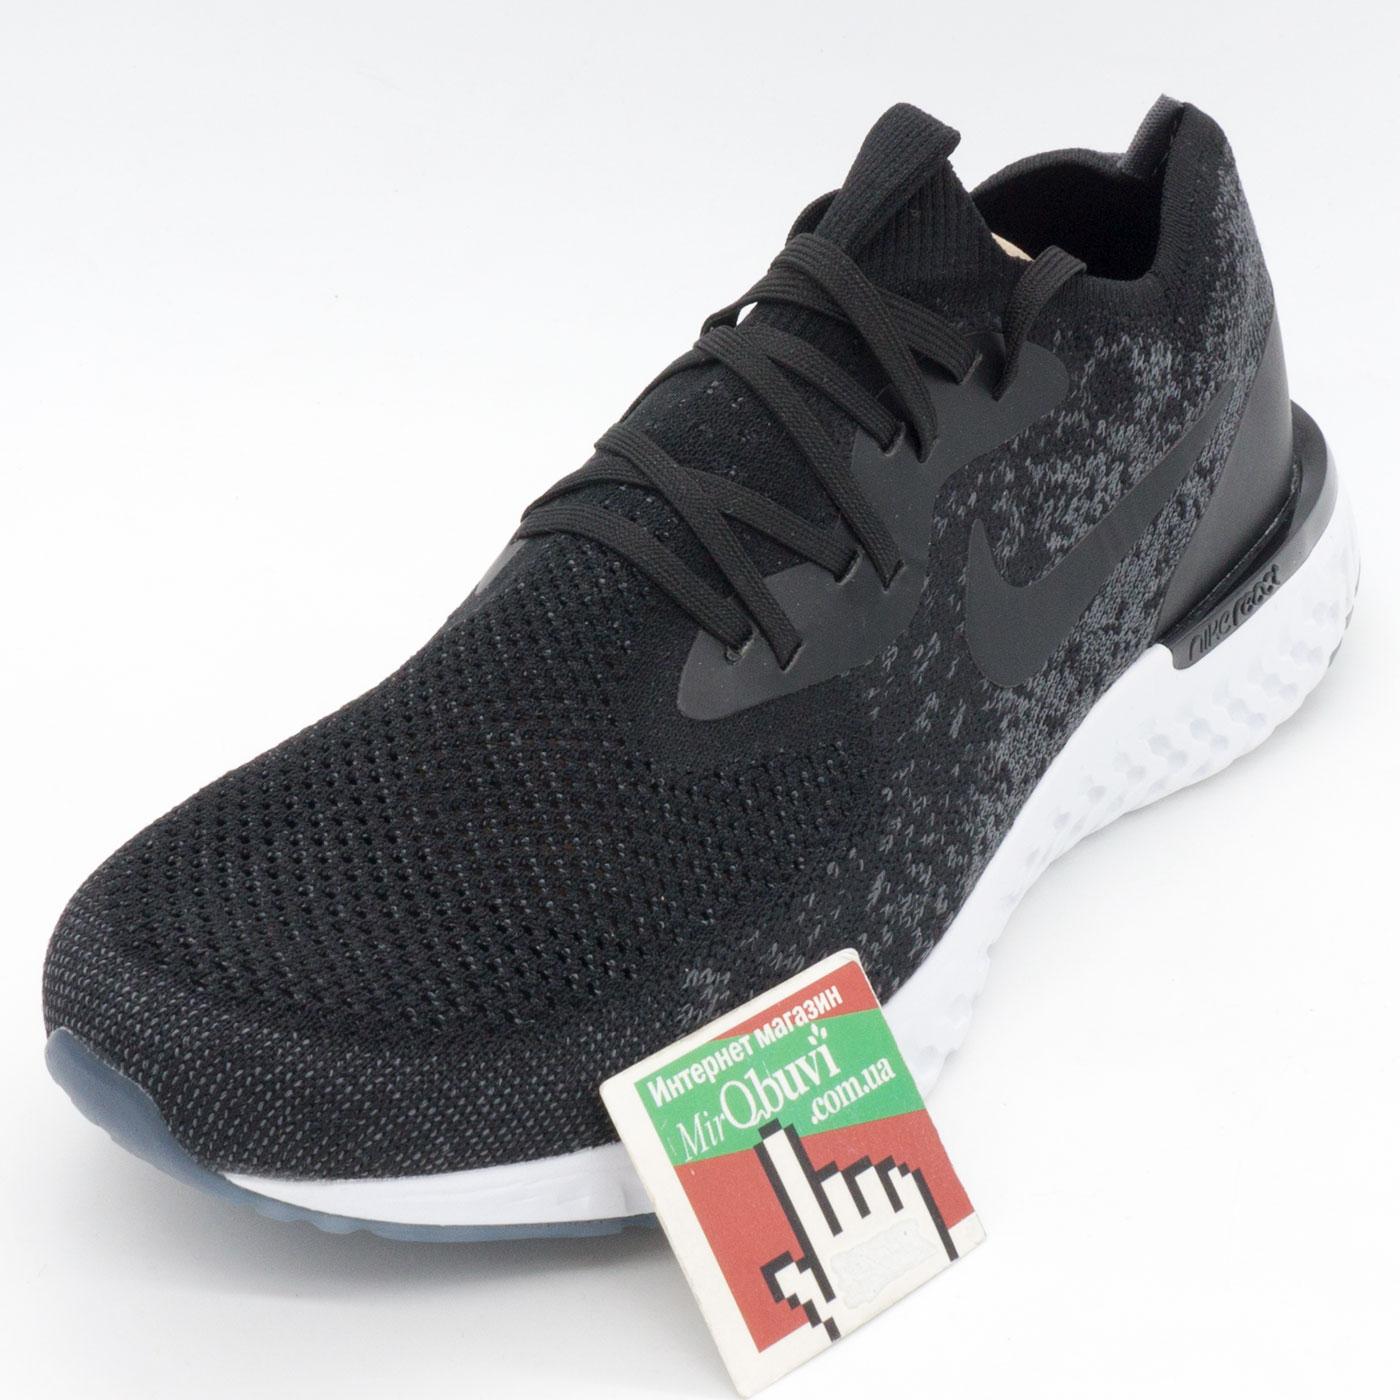 фото front Мужские кроссовки для бега Nike Epic React Flyknit черно-белые. Топ качество! front